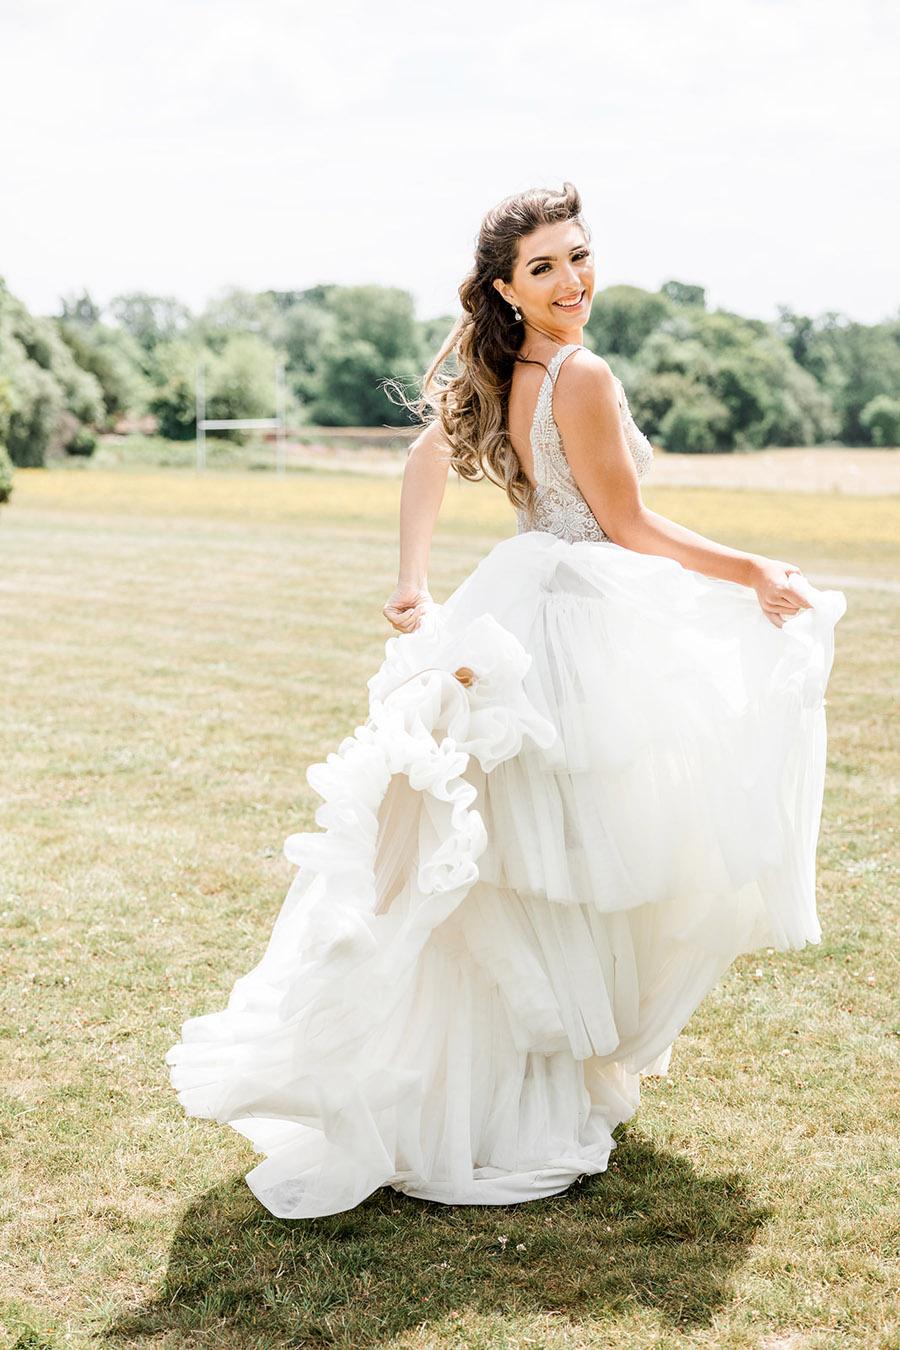 Modern Boho wedding style inspiration from Slindon House, photographer credit Kelsie Scully Photography (15)